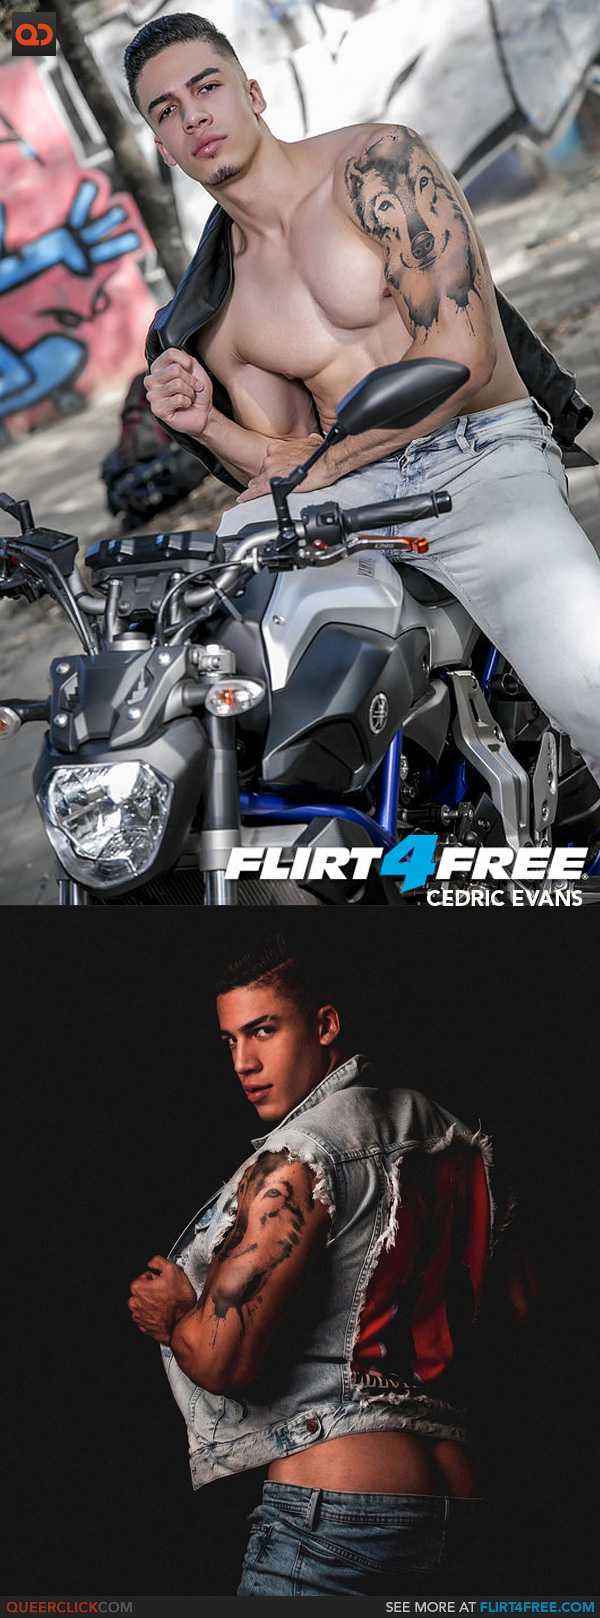 Flirt4Free: Cedric Evans